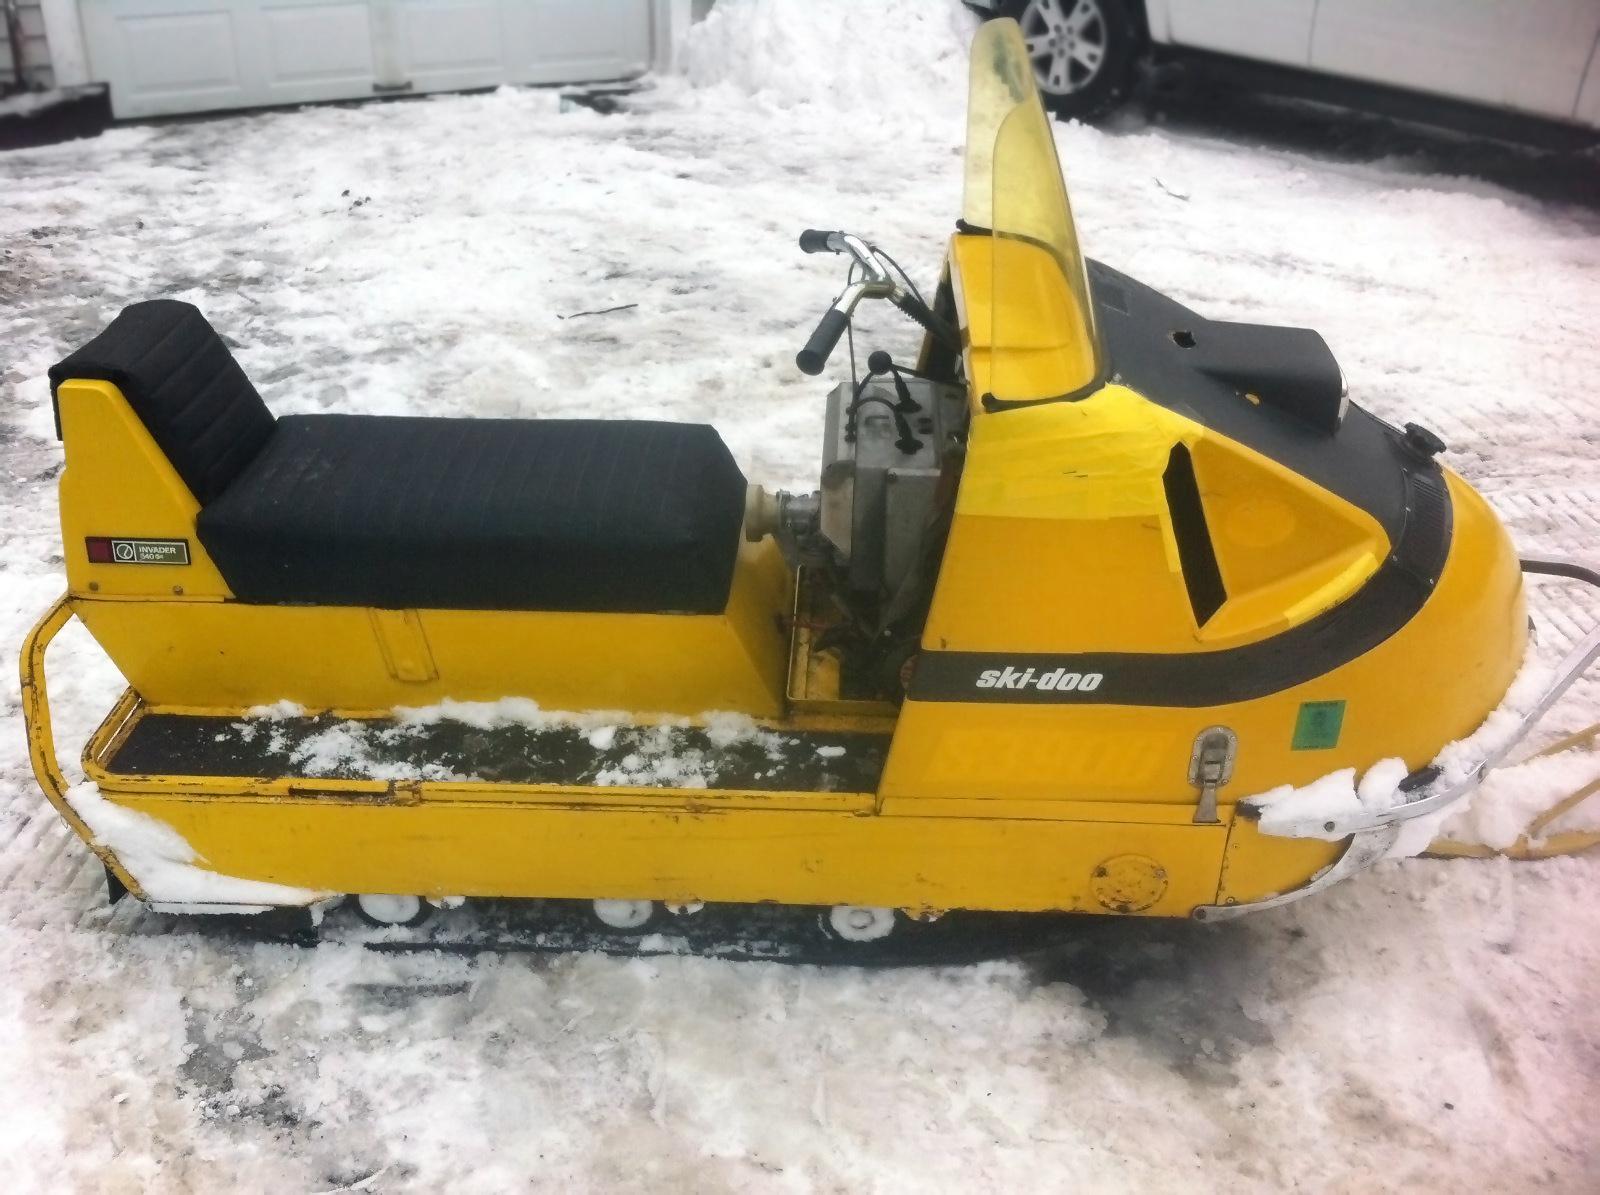 Ski Doo Snowmobiles For Sale >> Work Horse: 1970 Ski-Doo Alpine Invader 640/ER